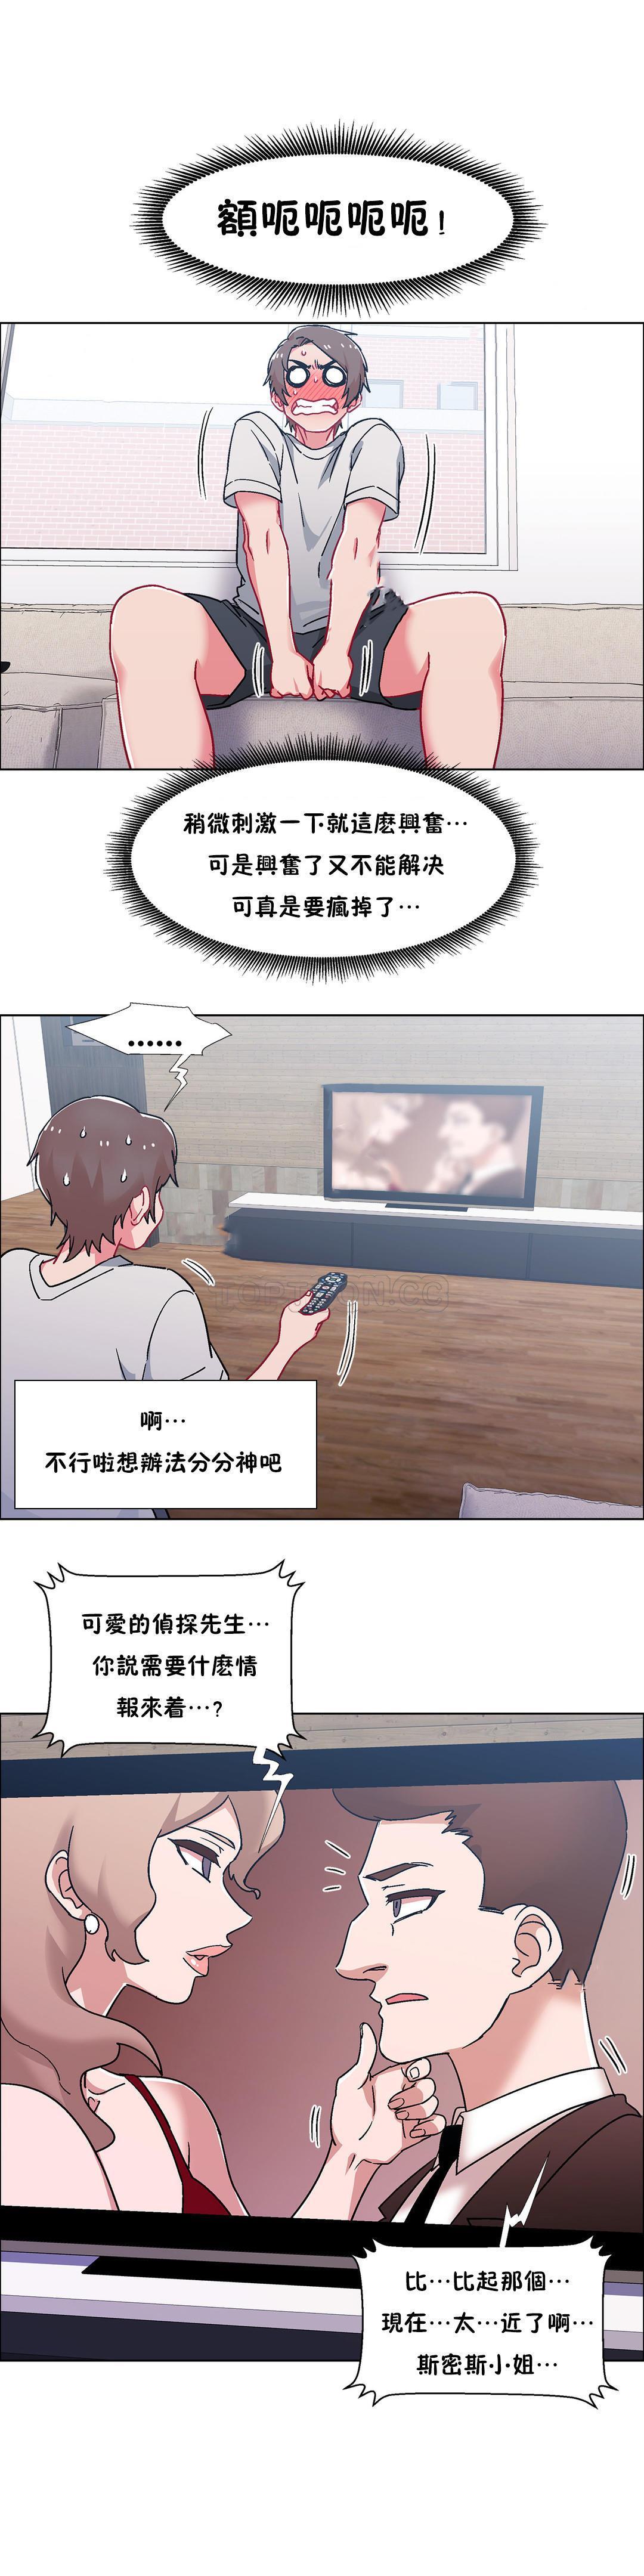 [Studio Wannabe] Rental Girls | 出租女郎 Ch. 33-58 [Chinese]  第二季 完结 464